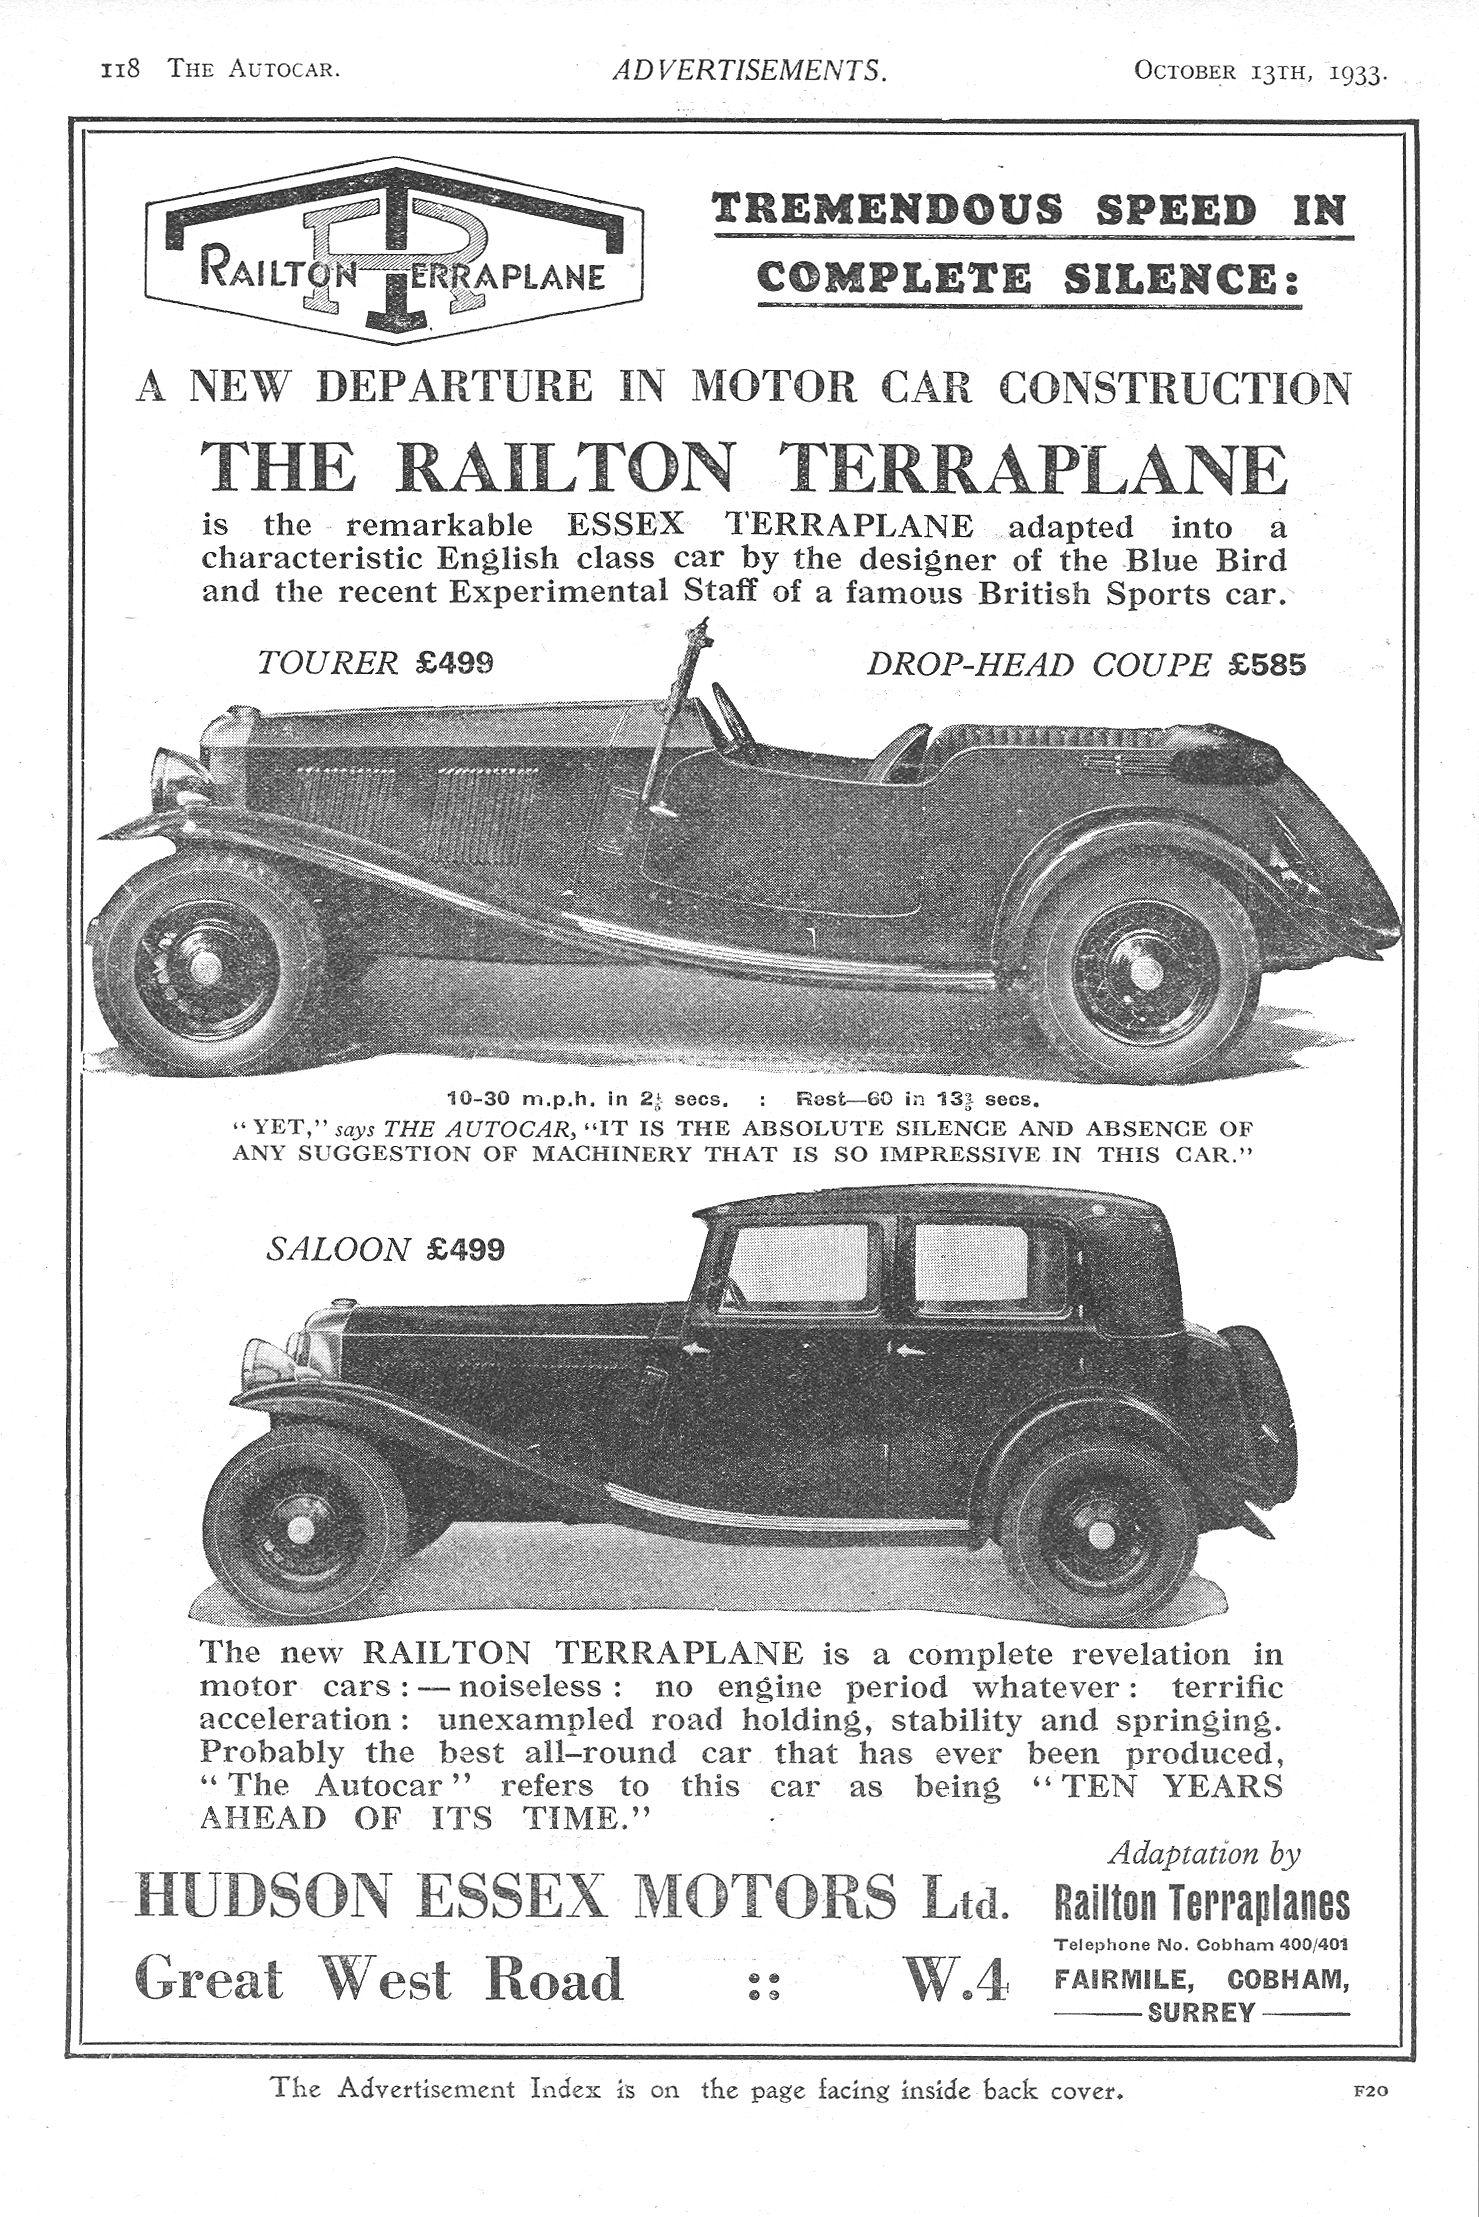 Railton Terraplane Motor Car Autocar Advert 1933 | Vintage and ...